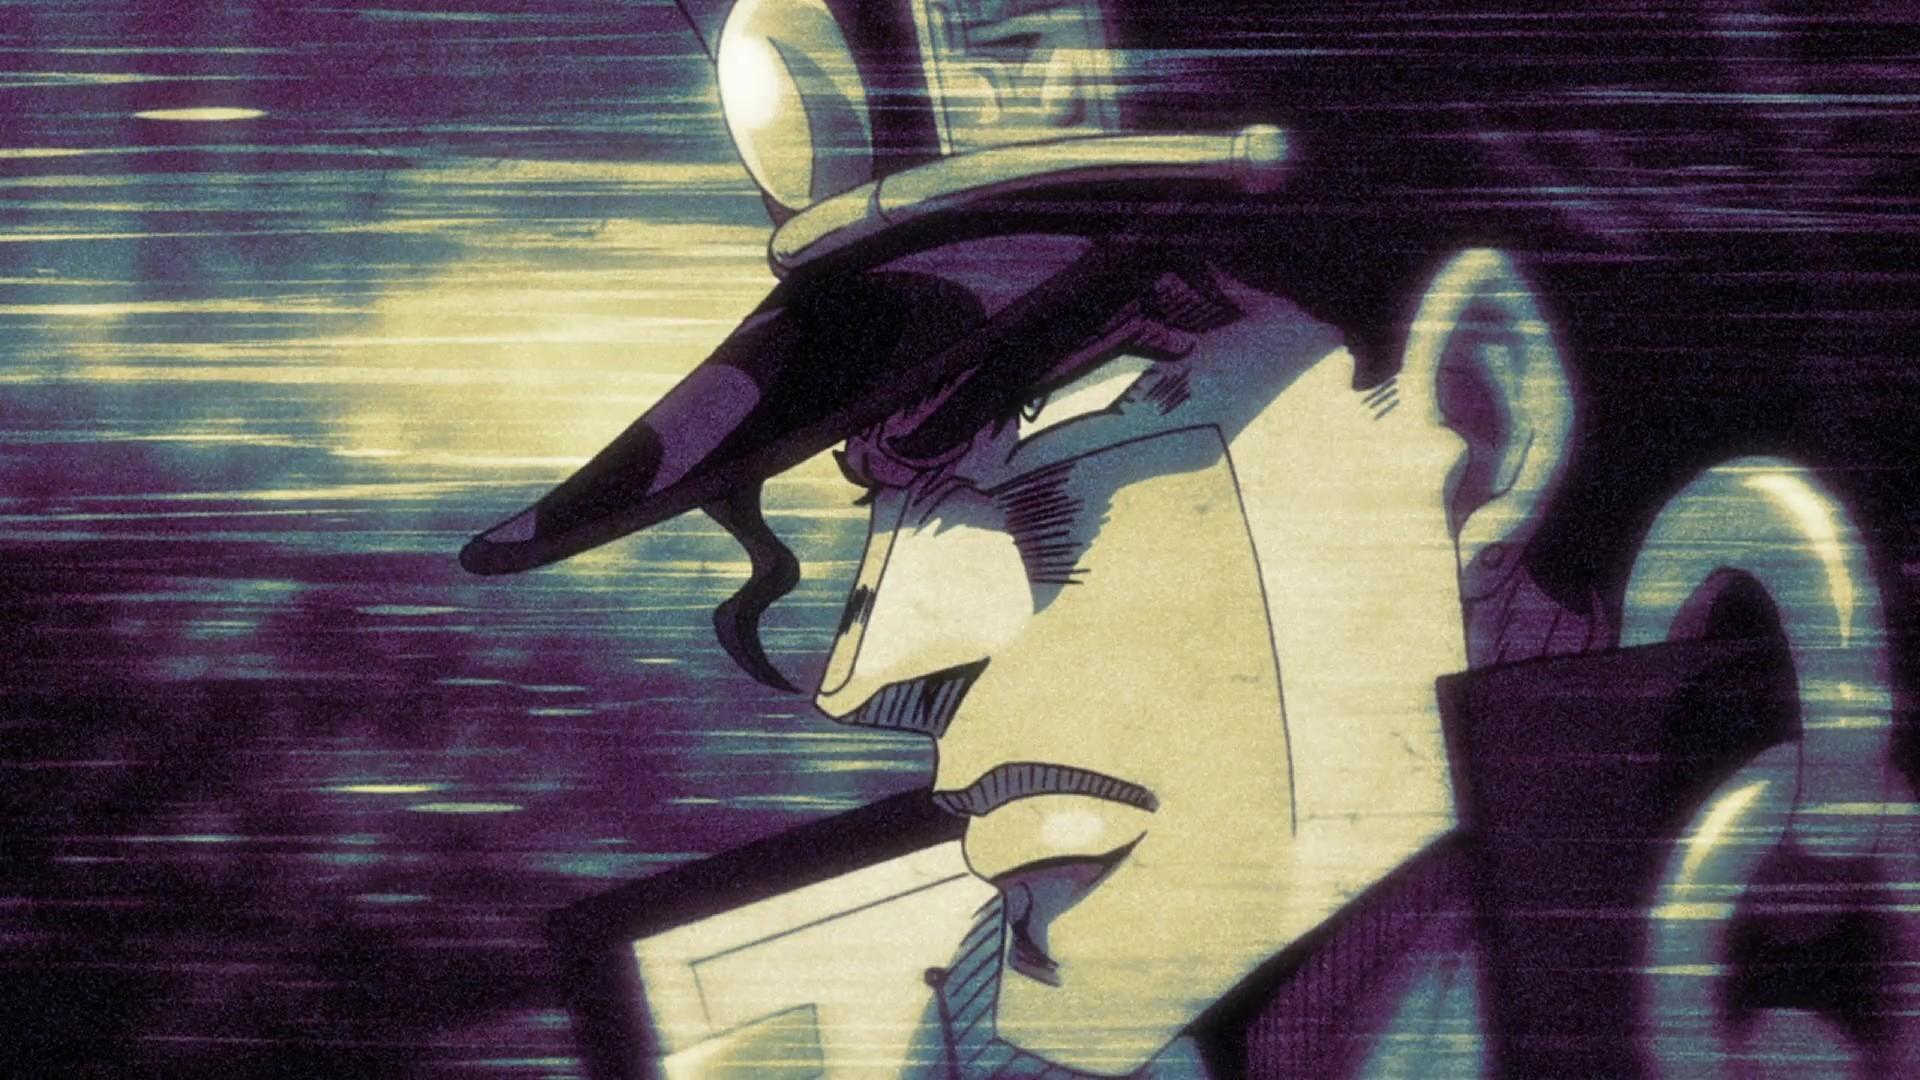 Jotaro Kujo, Jojo's Bizarre Adventure: Stardust Crusaders. Wallpaper Details